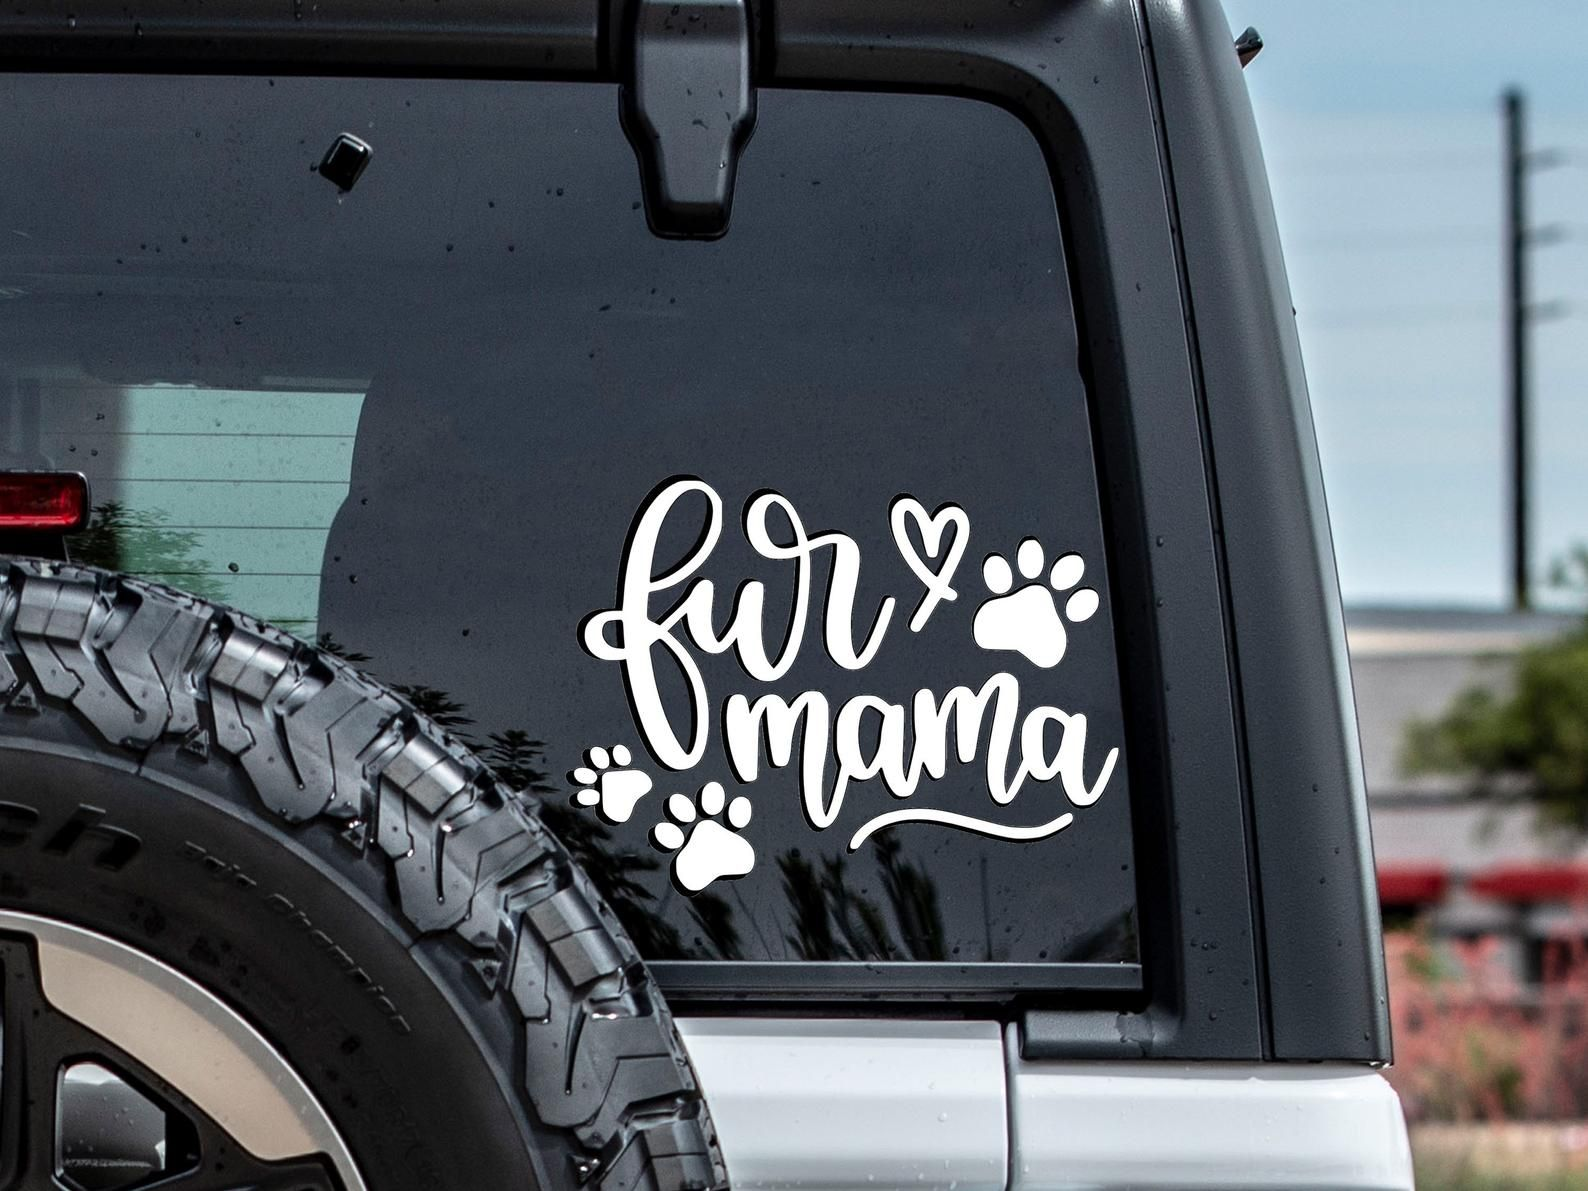 Fur Mama Car Decal Car Decals For Women Cute Vinyl Decals Etsy Car Decals Fur Mama Car [ 1191 x 1588 Pixel ]